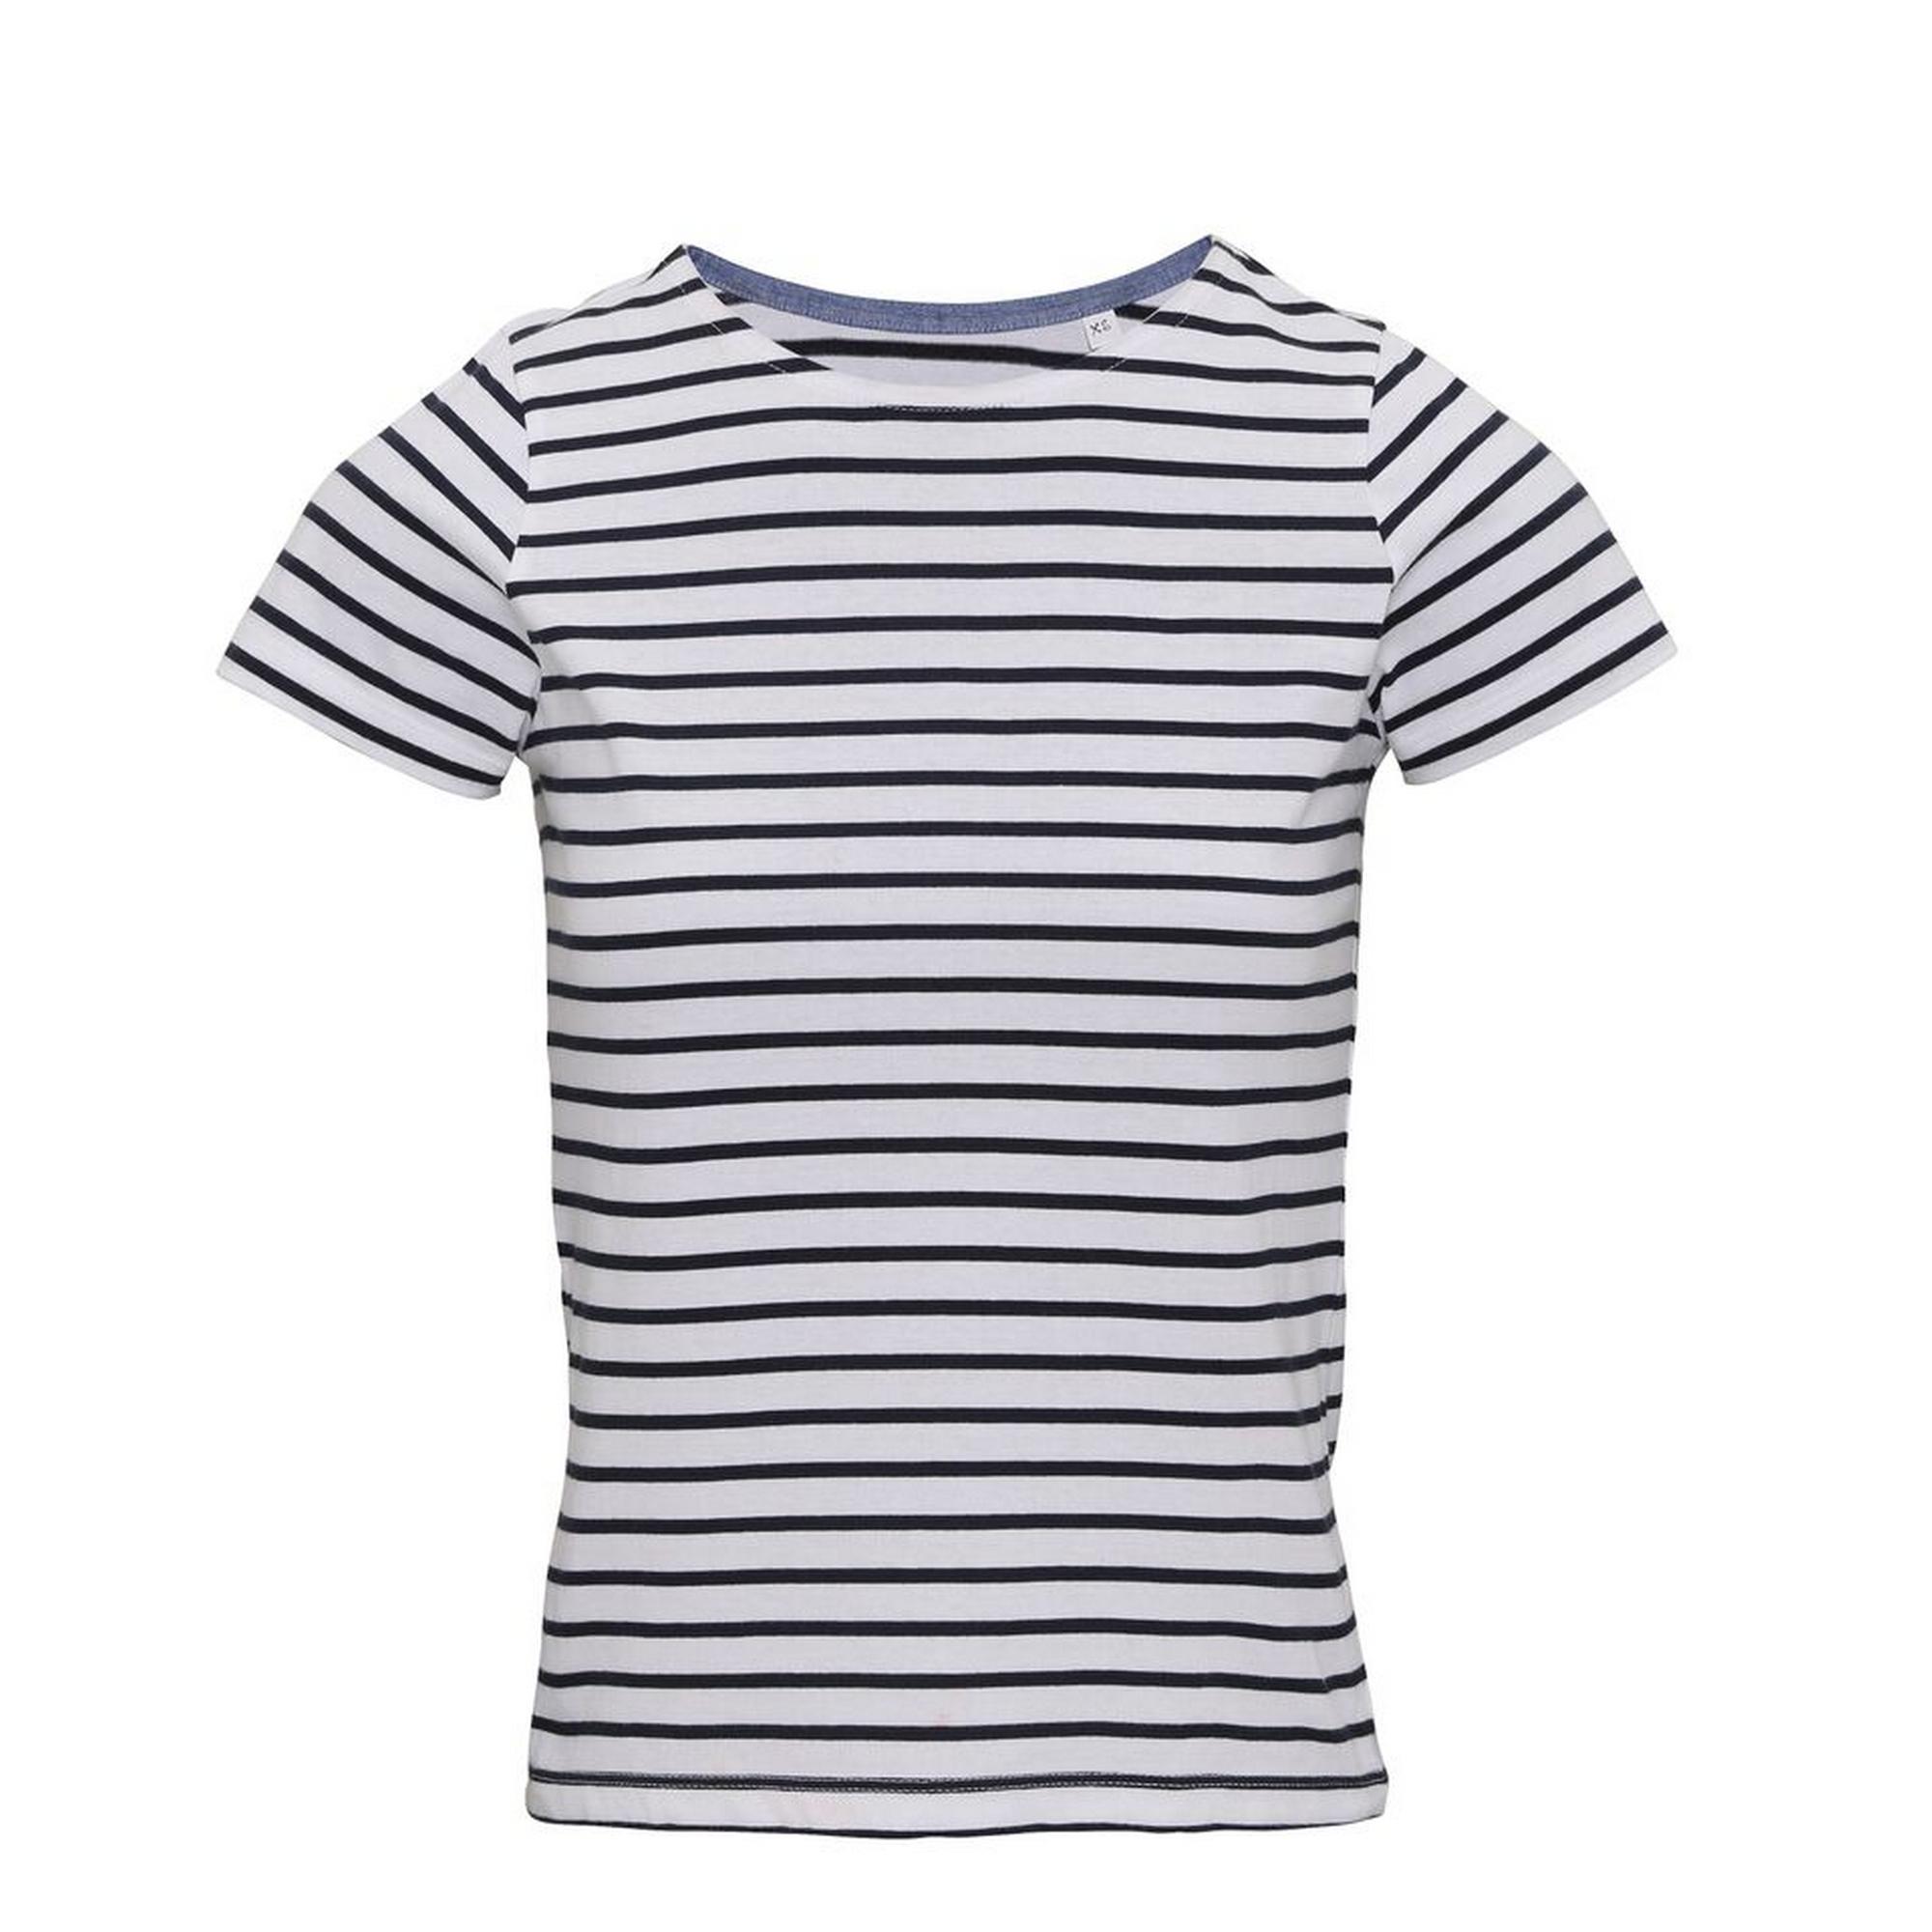 Asquith & Fox Womens/Ladies Mariniere Coastal Short Sleeve T-Shirt (M) (White/Navy)